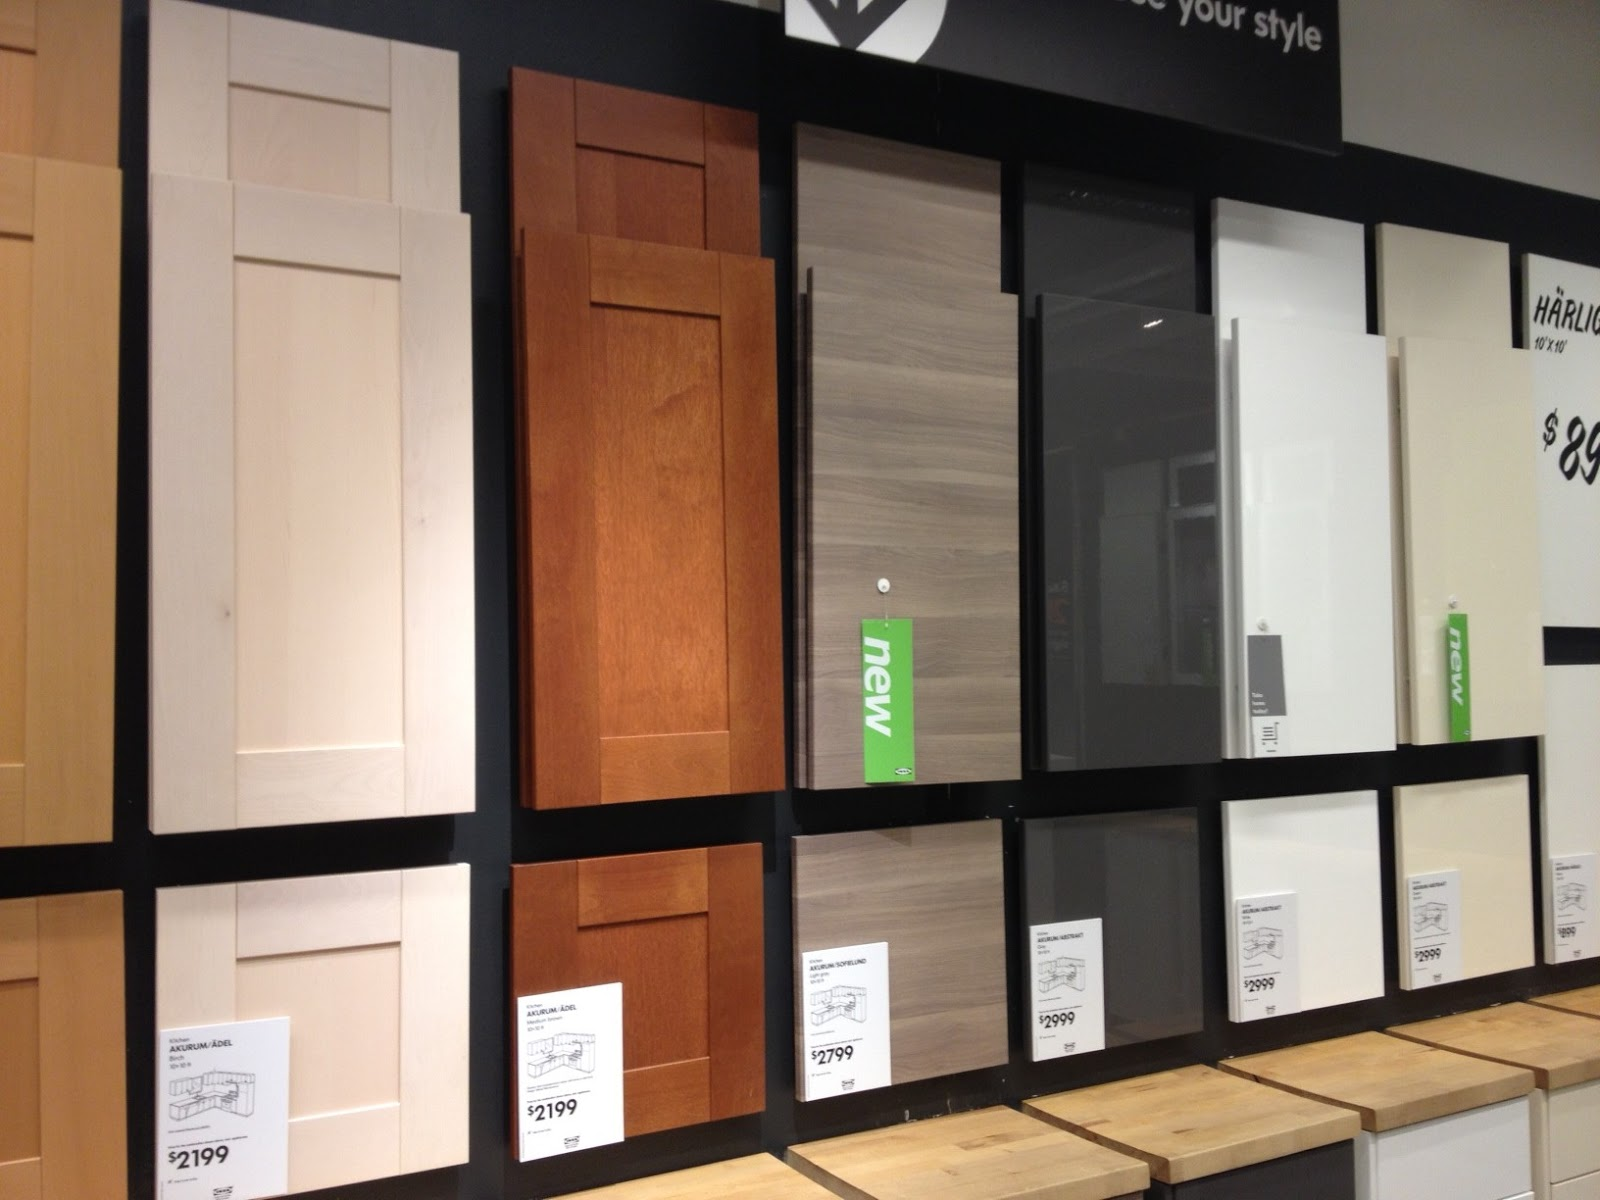 Reface Kitchen Cabinet Doors